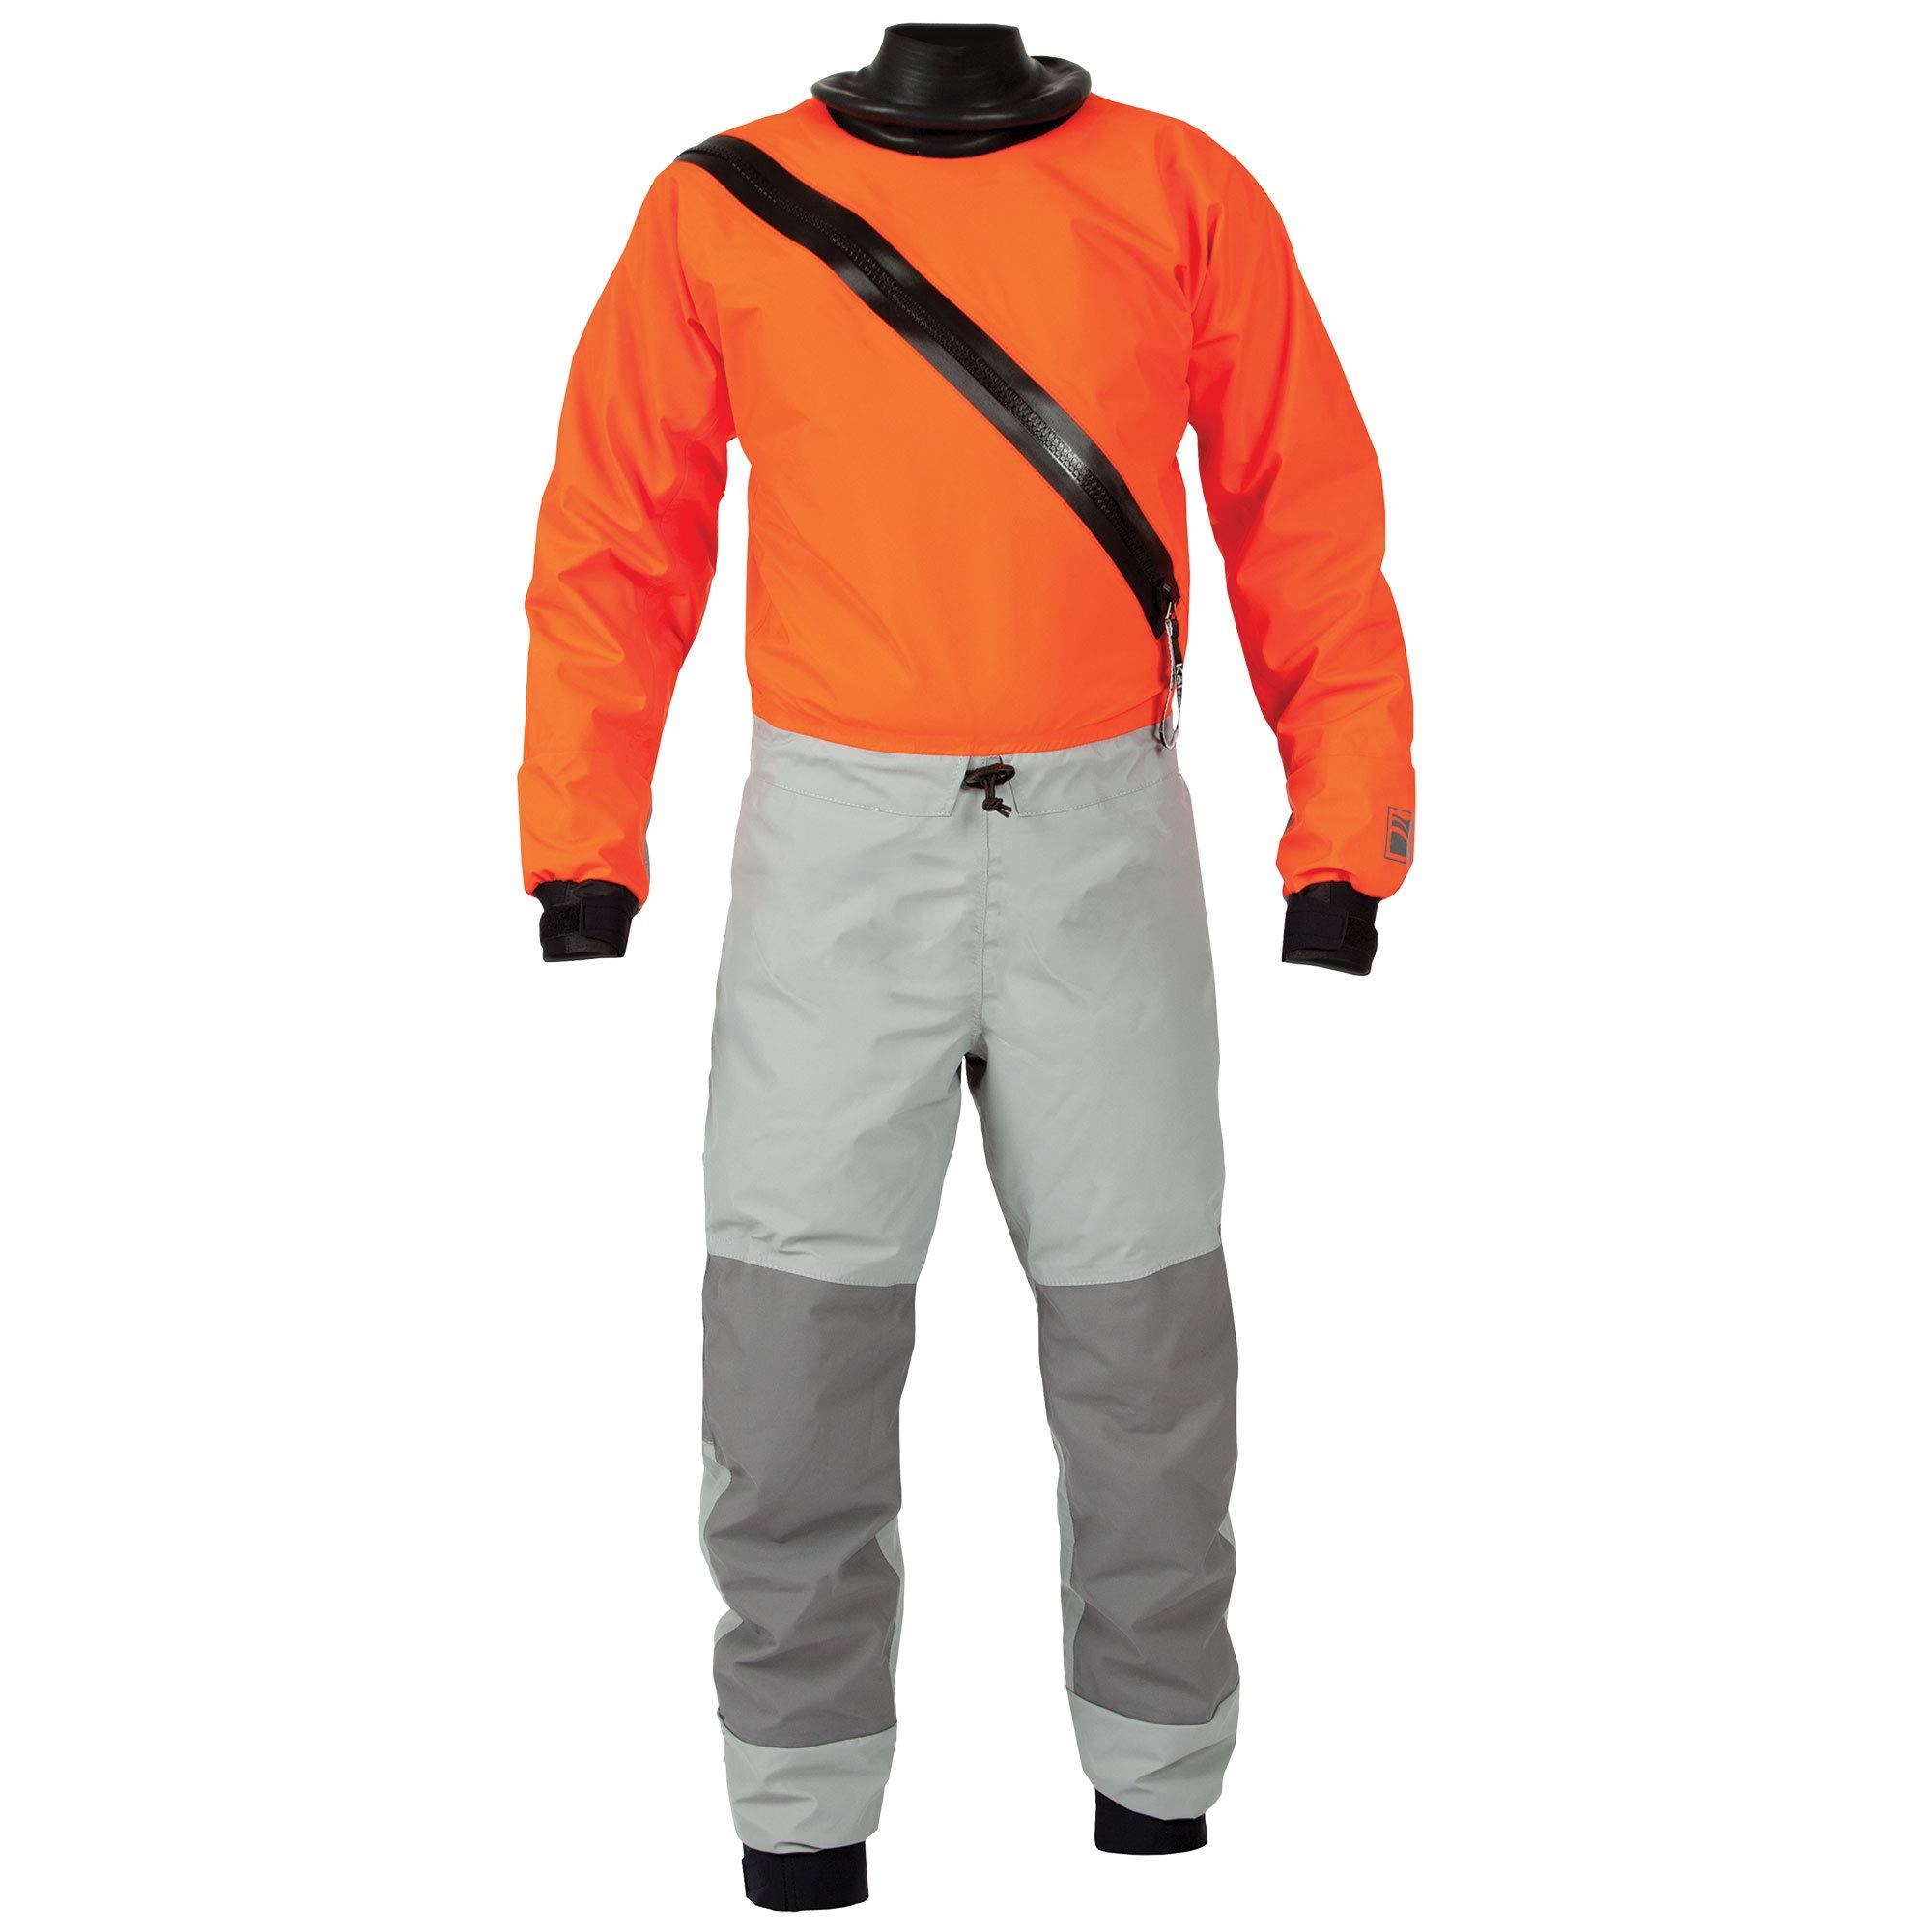 Kokatat Men's Hydrus Swift Entry Drysuit-Tangerine-L